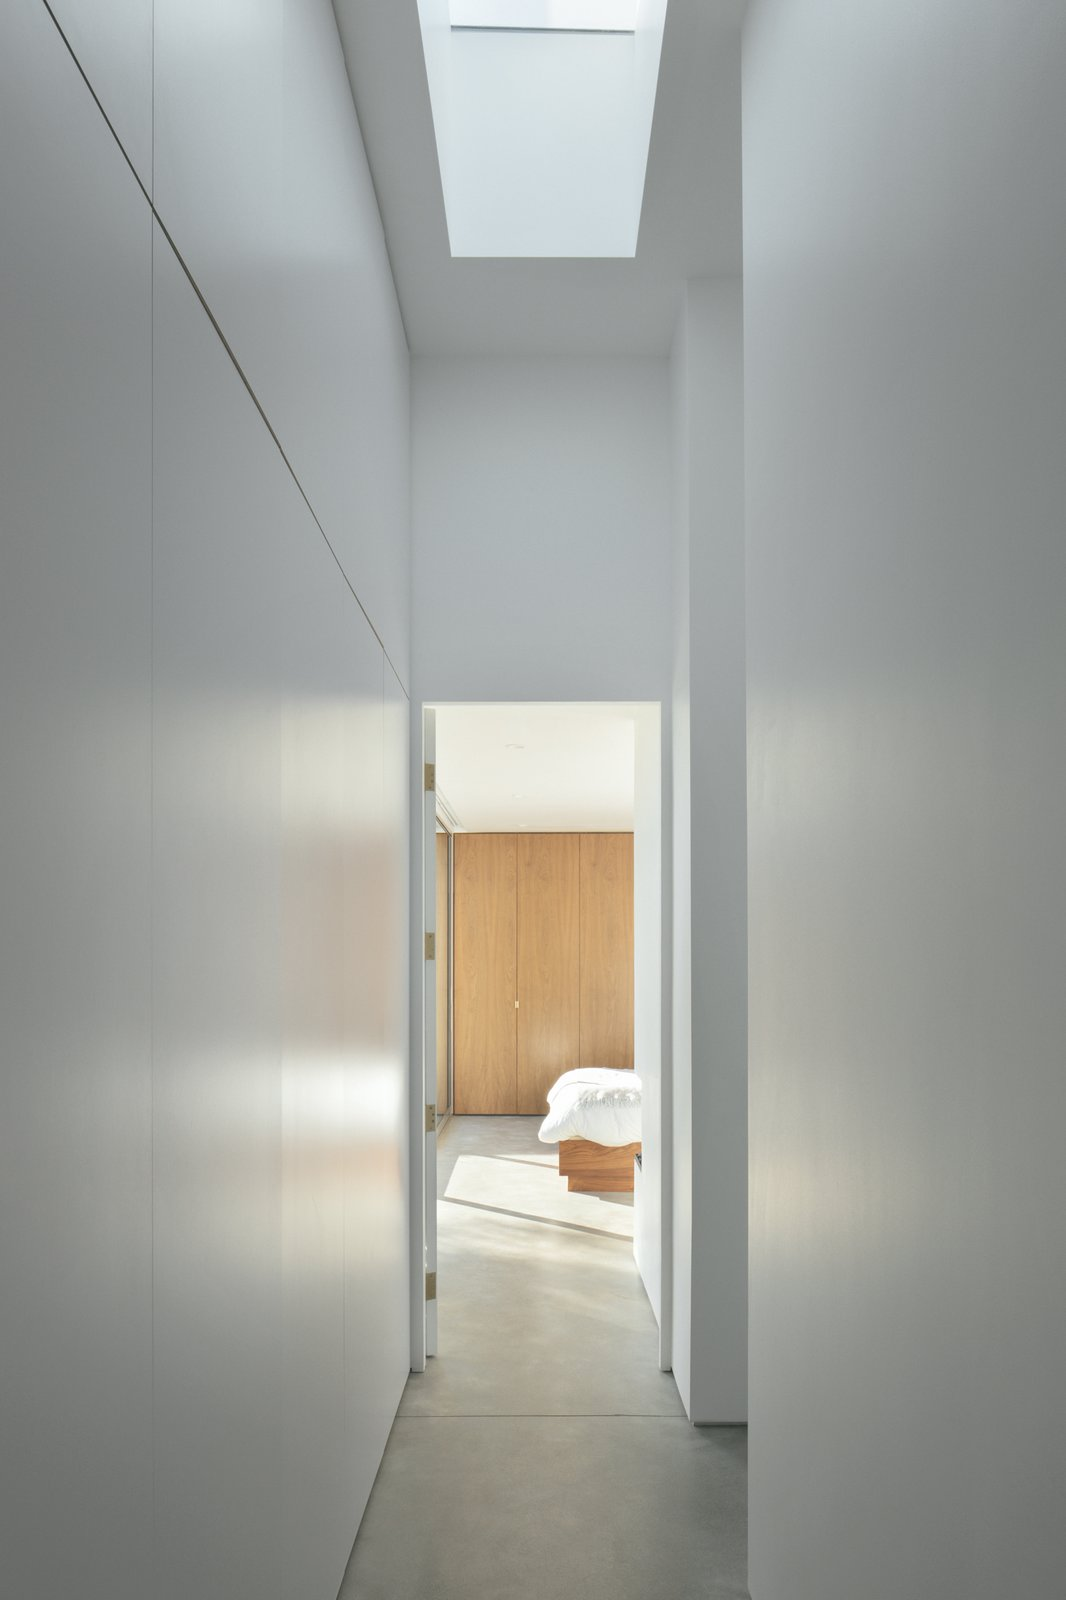 Hallway and Concrete Floor  Best Photos from Minimalist Urban Residence